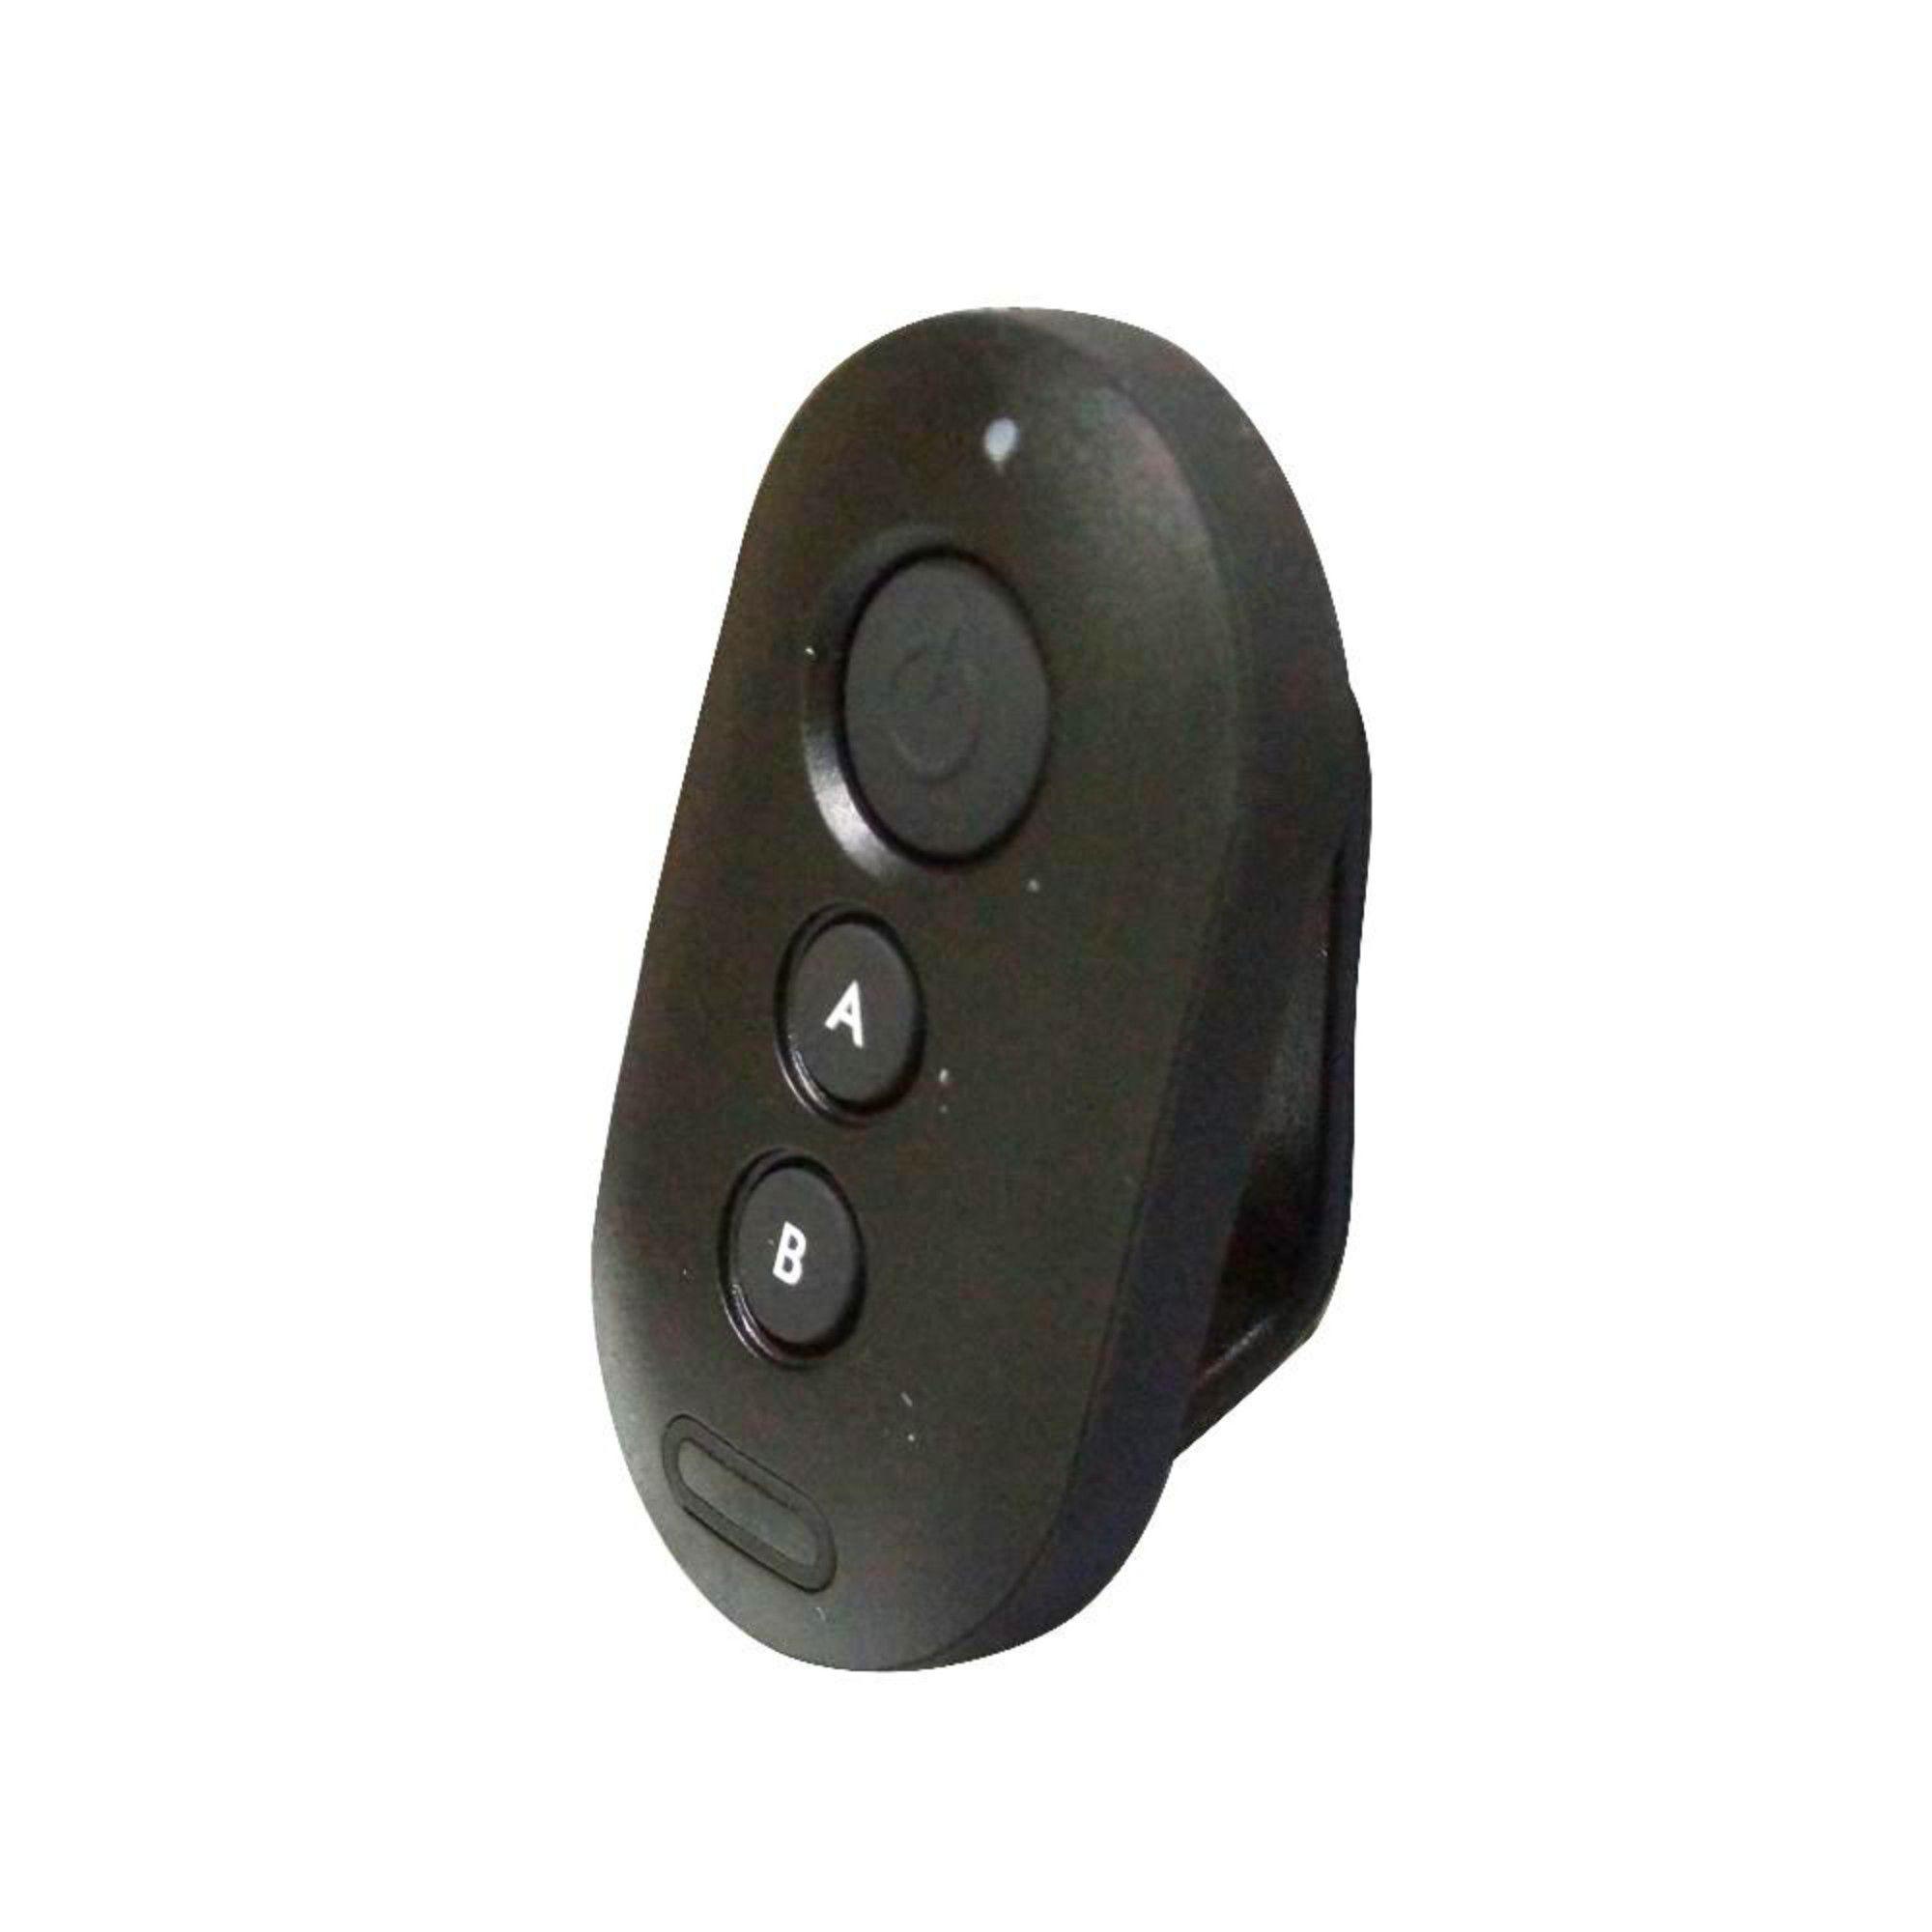 Controle Remoto Intelbras XAC 4000 Smart Preto